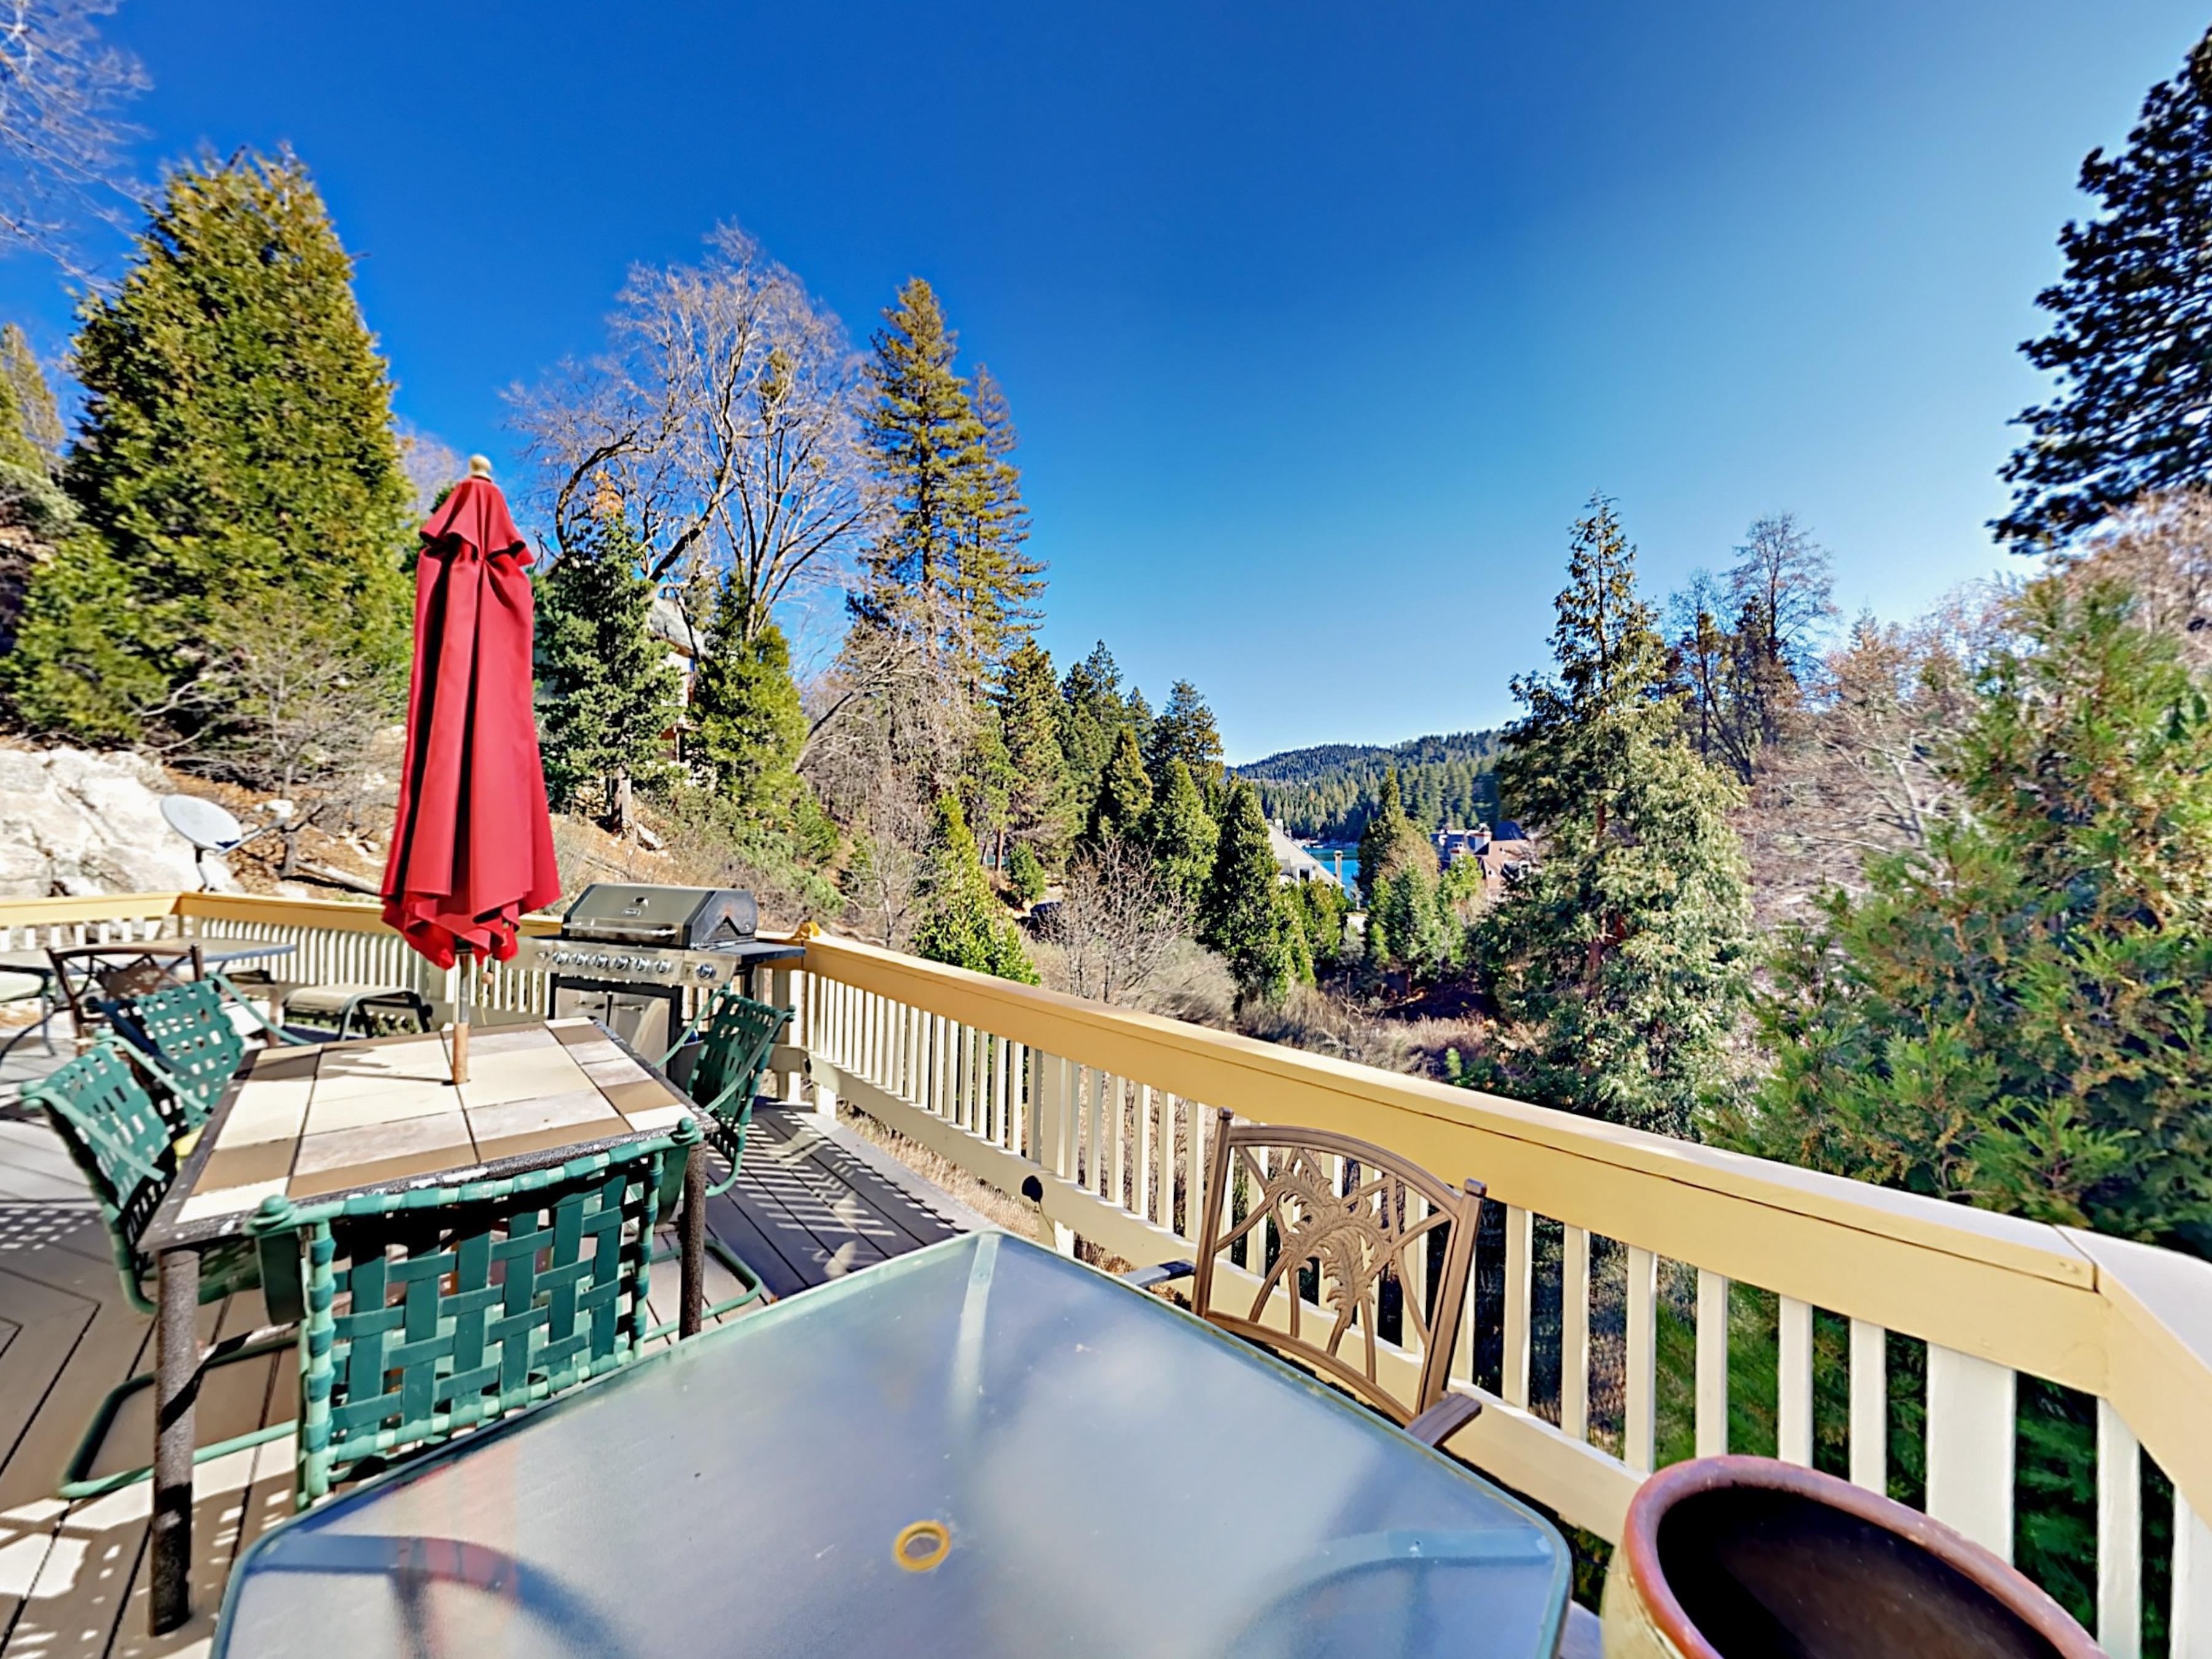 Lake Arrowhead CA Vacation Rental Welcome to Lake